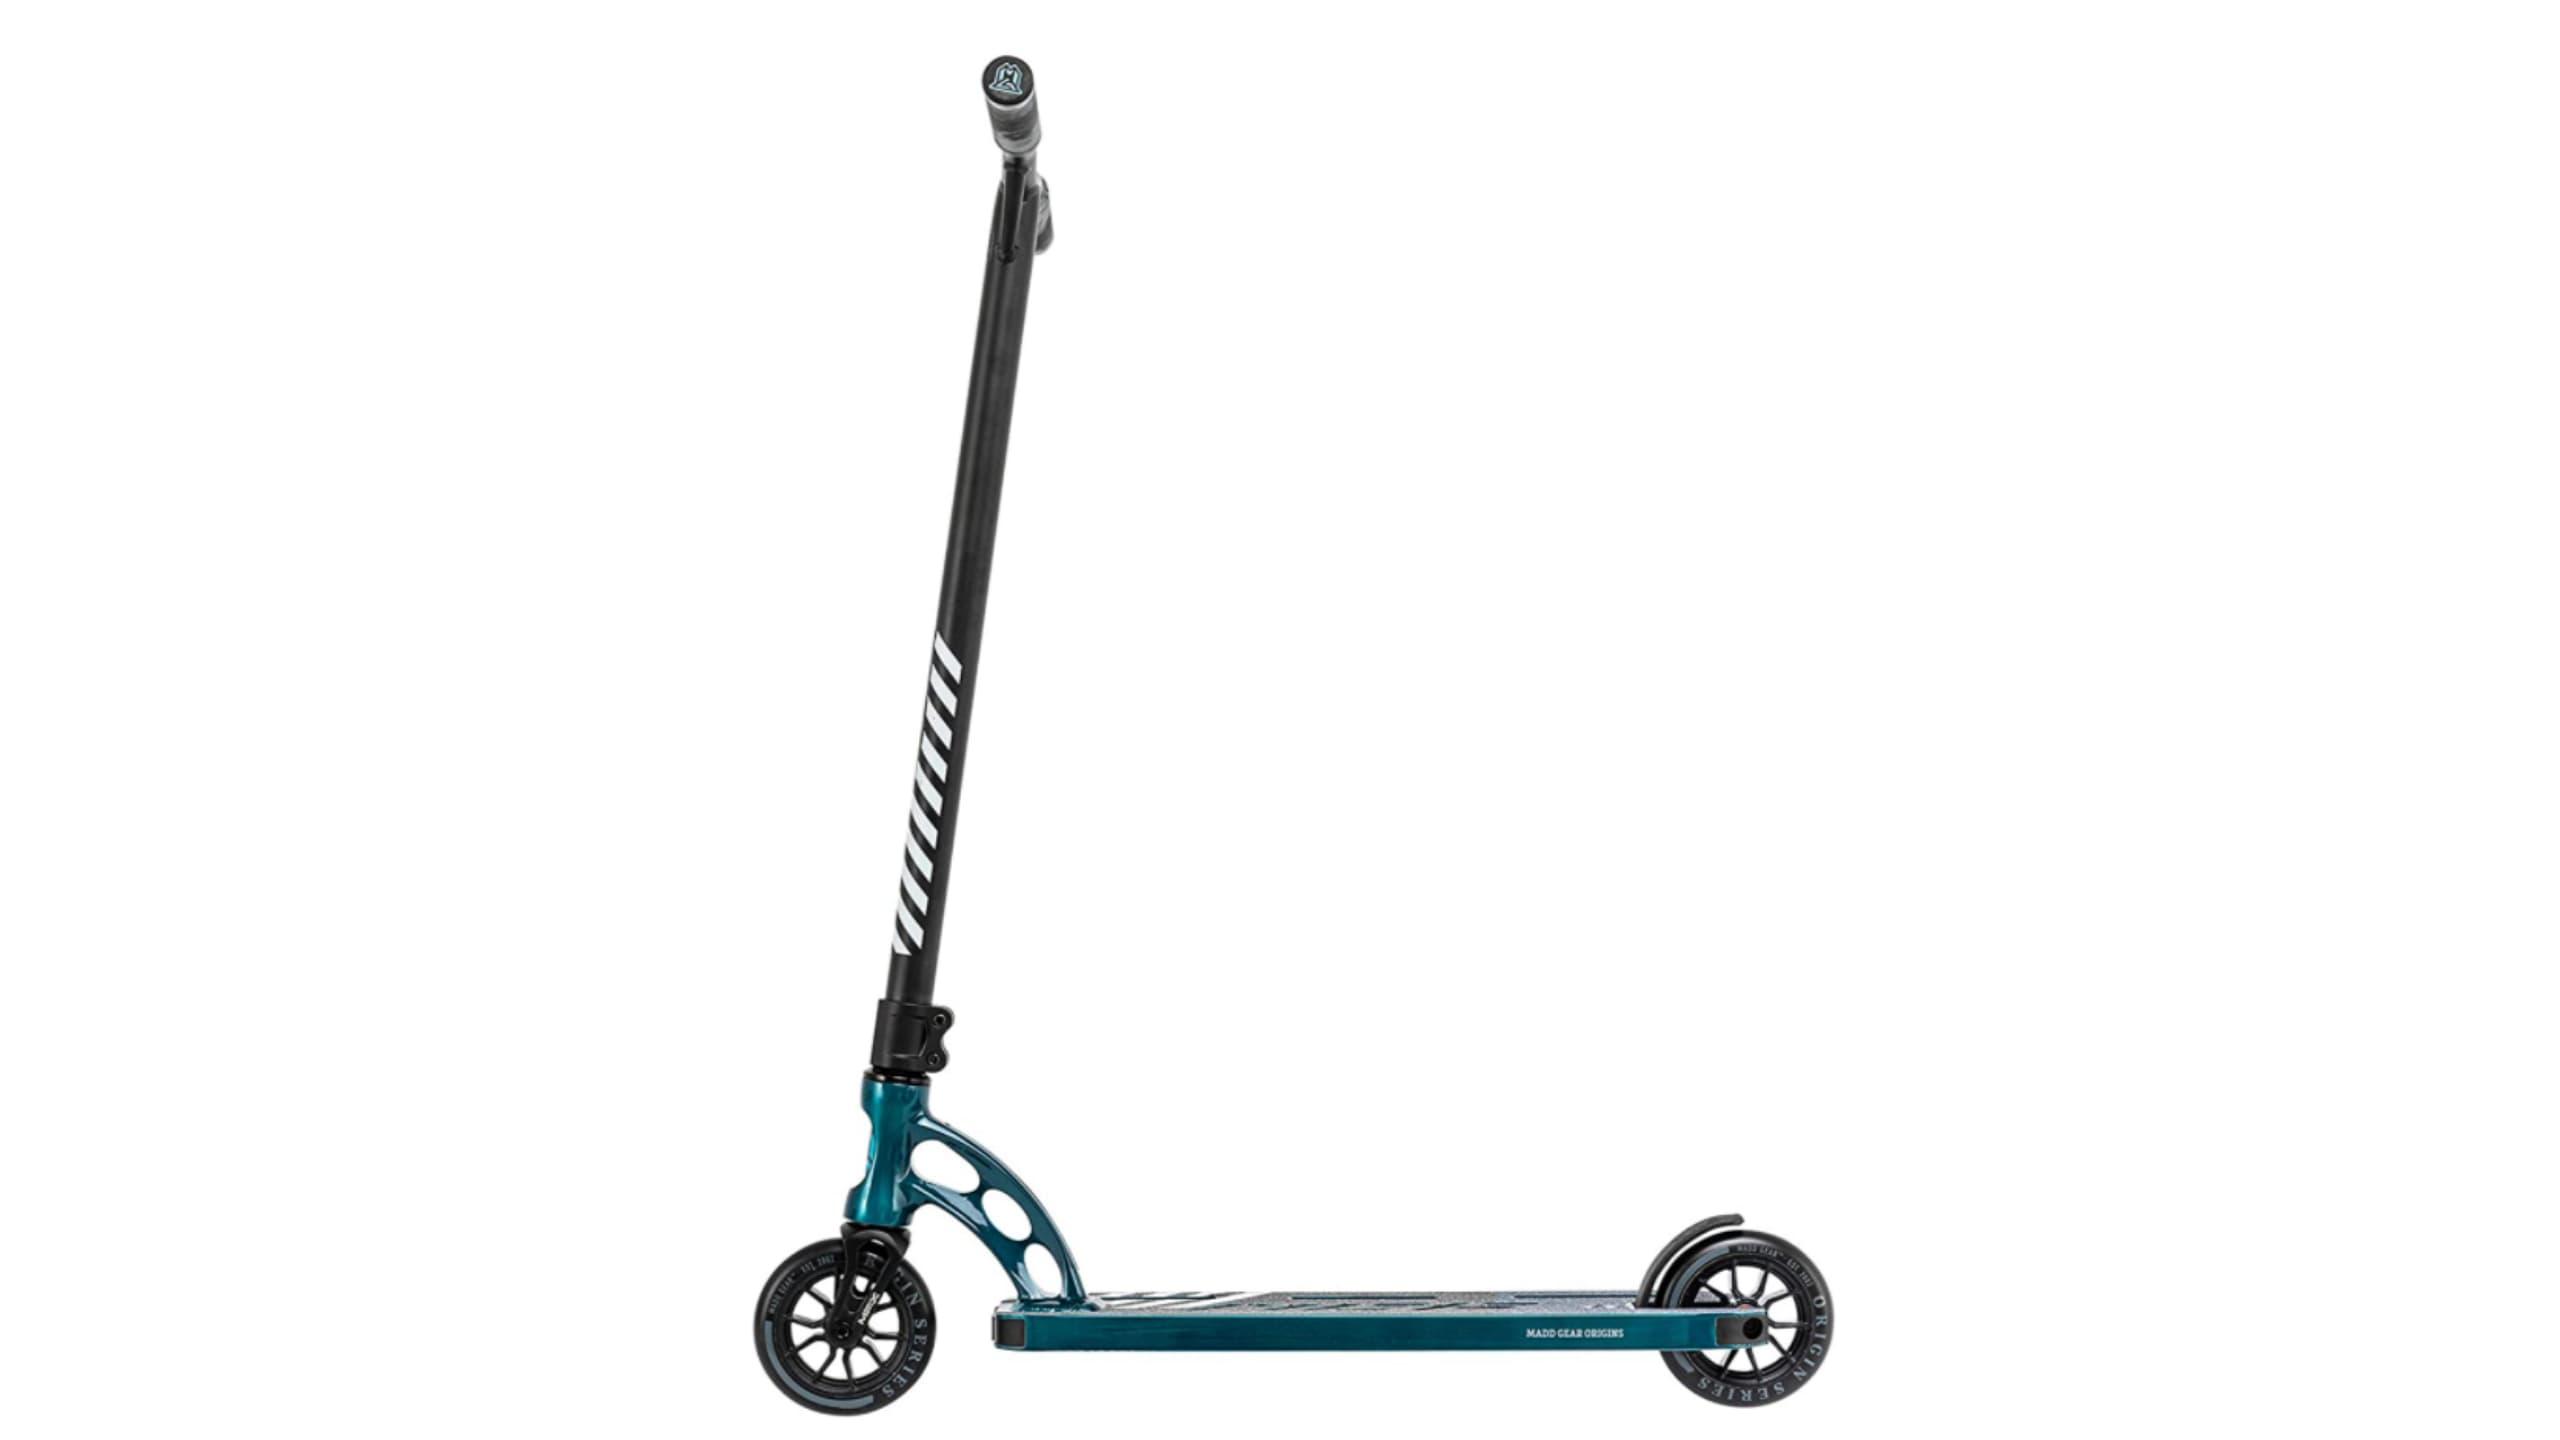 die besten mgp stunt scooter